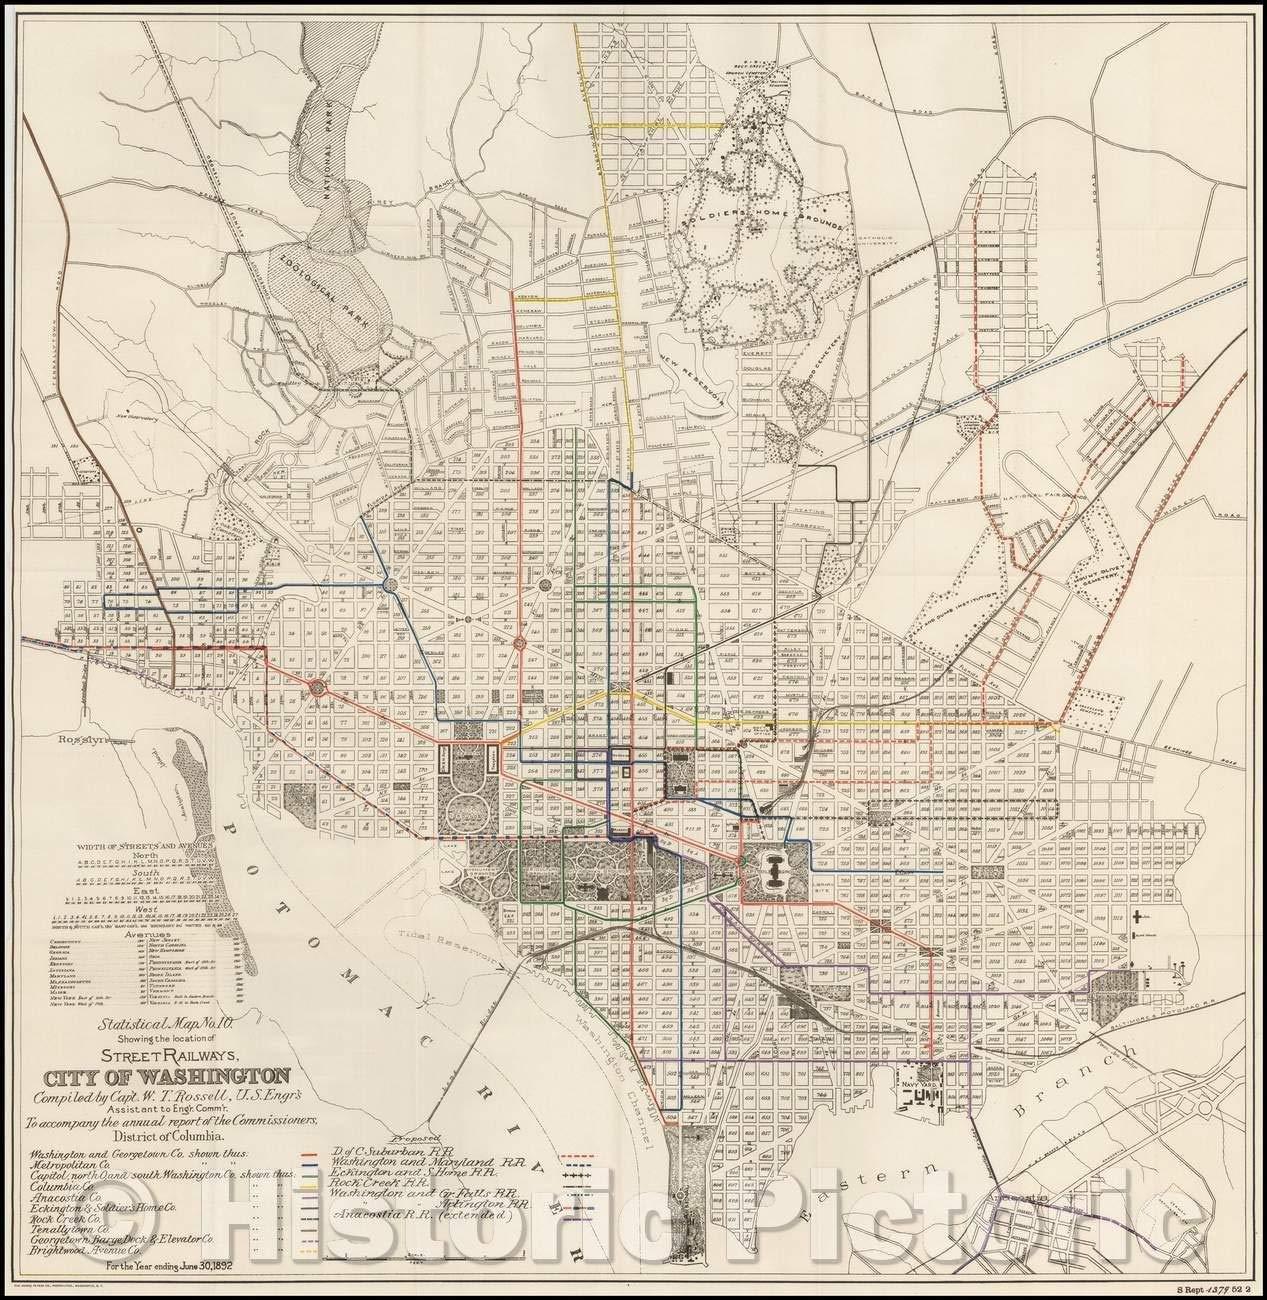 Amazon.com: Historic Map - Washington, D.C, Statistical Map ...